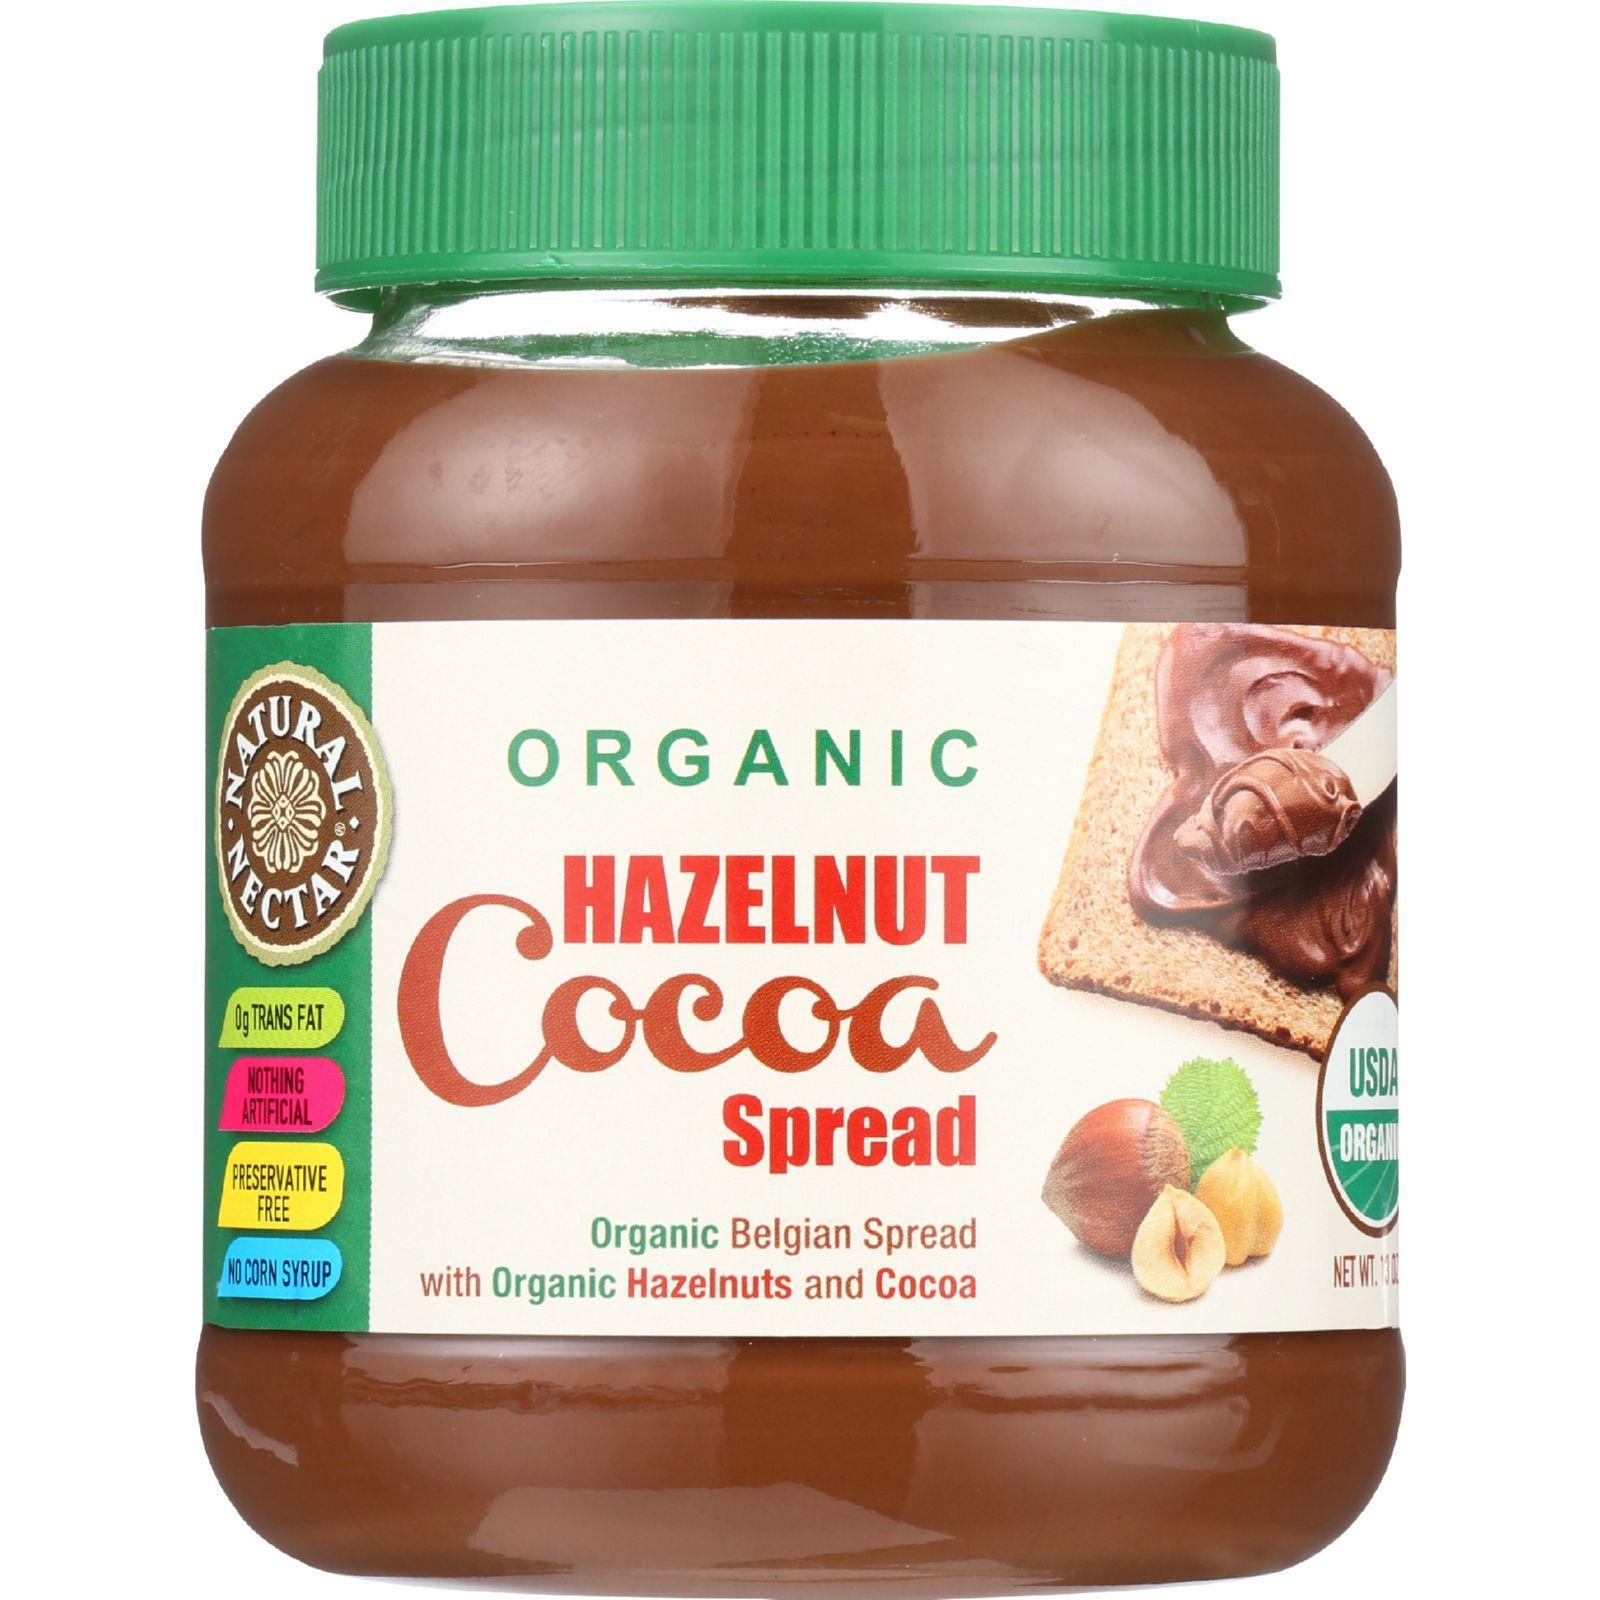 Natural Nectar Spread - Organic - Hazelnut Cocoa - 13 oz - case of 12